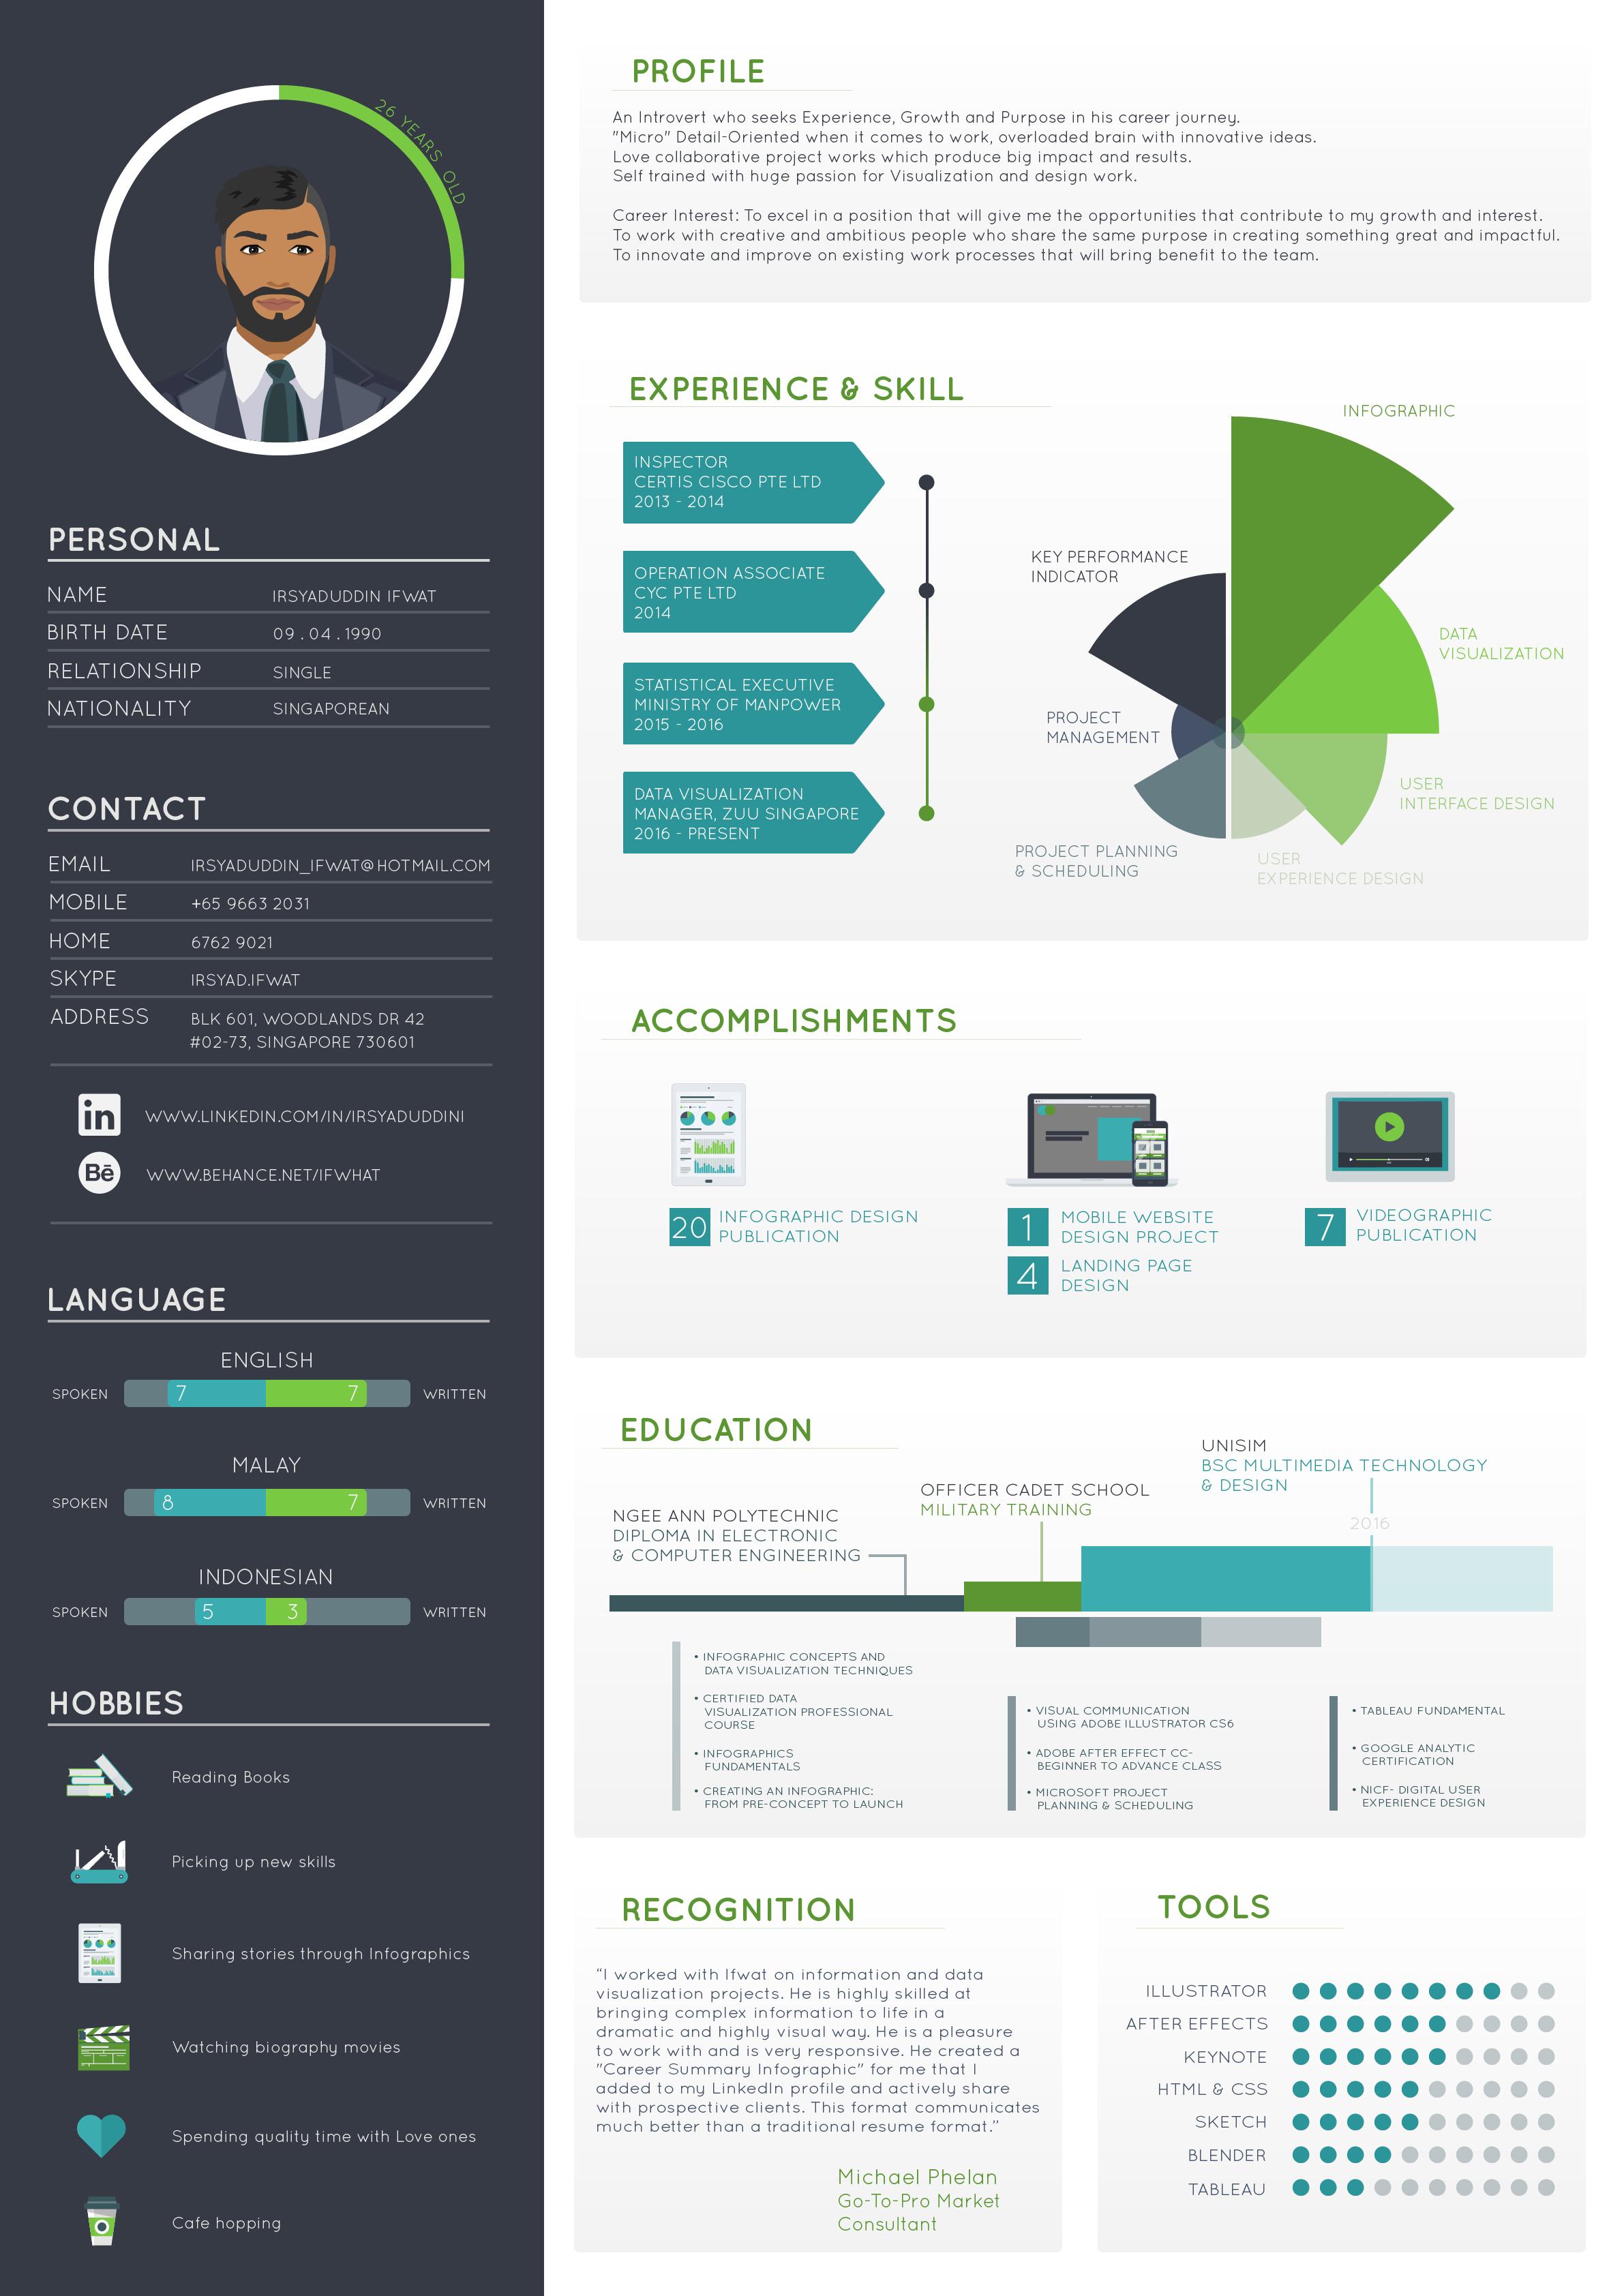 Infographic CV van Irsyaduddin ifwat